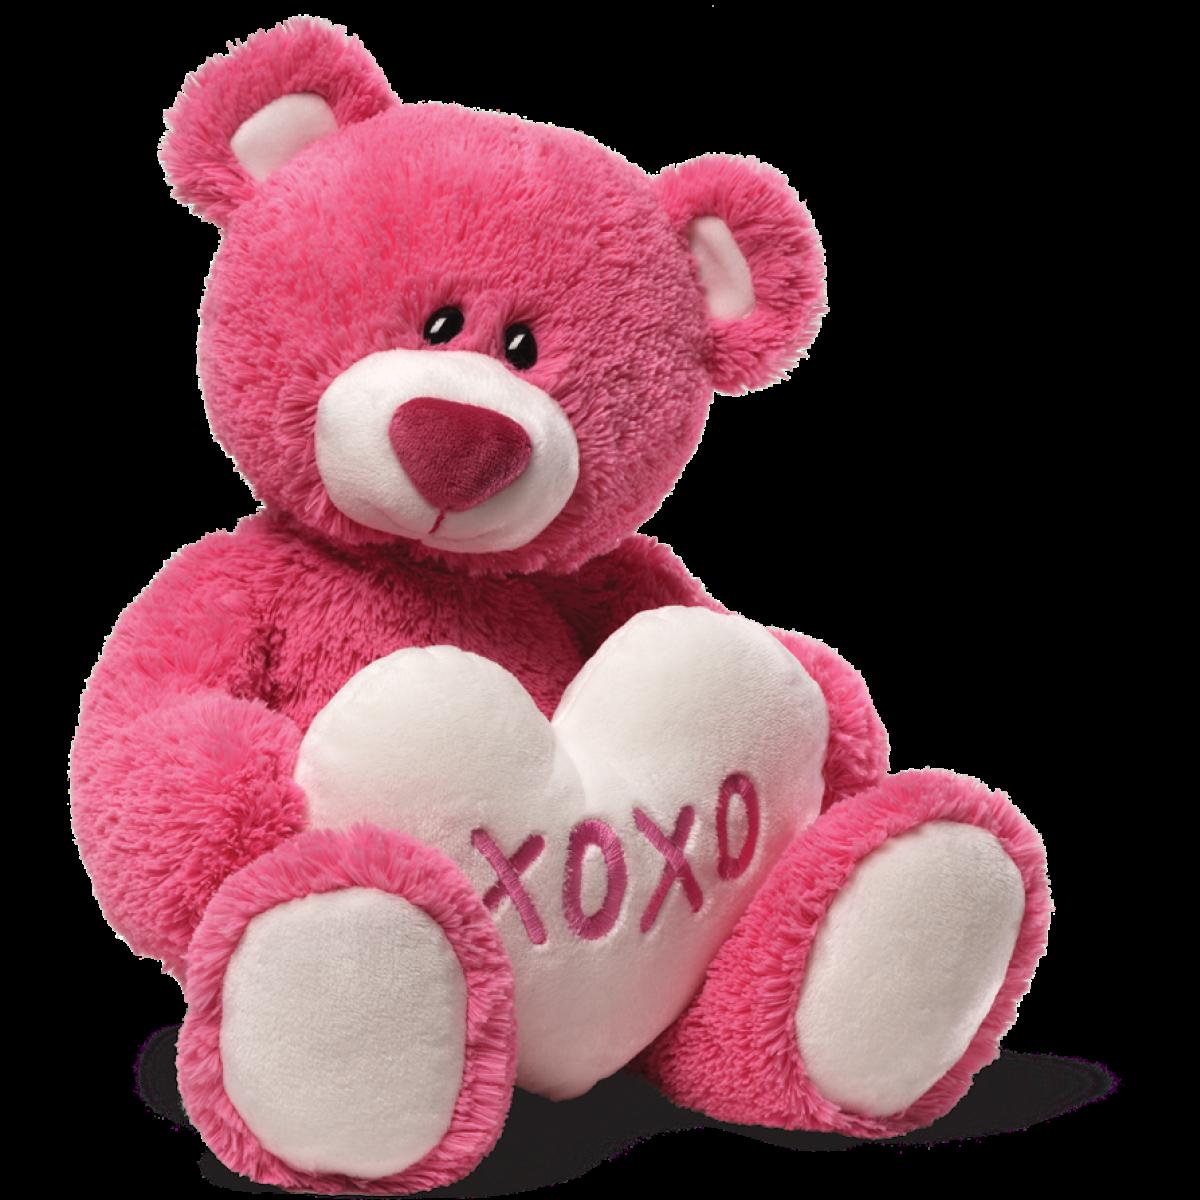 Teddy Bear Png Hd PNG Image - Bear HD PNG